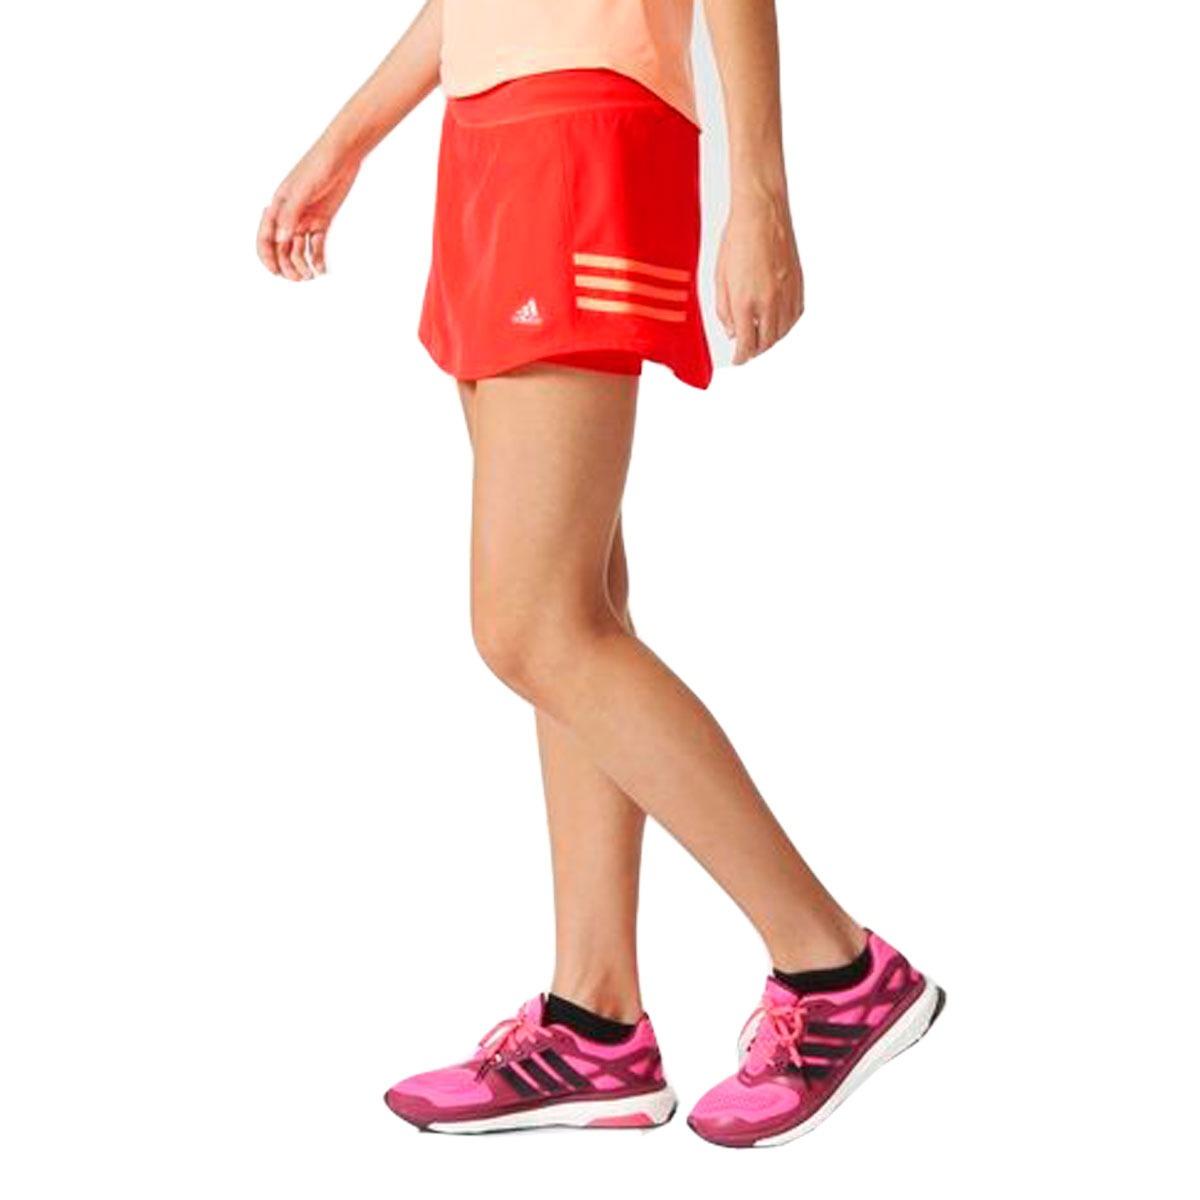 saia feminina de corrida adidas shorts interno esportiva. Carregando zoom. 70c7acb4e6aa0